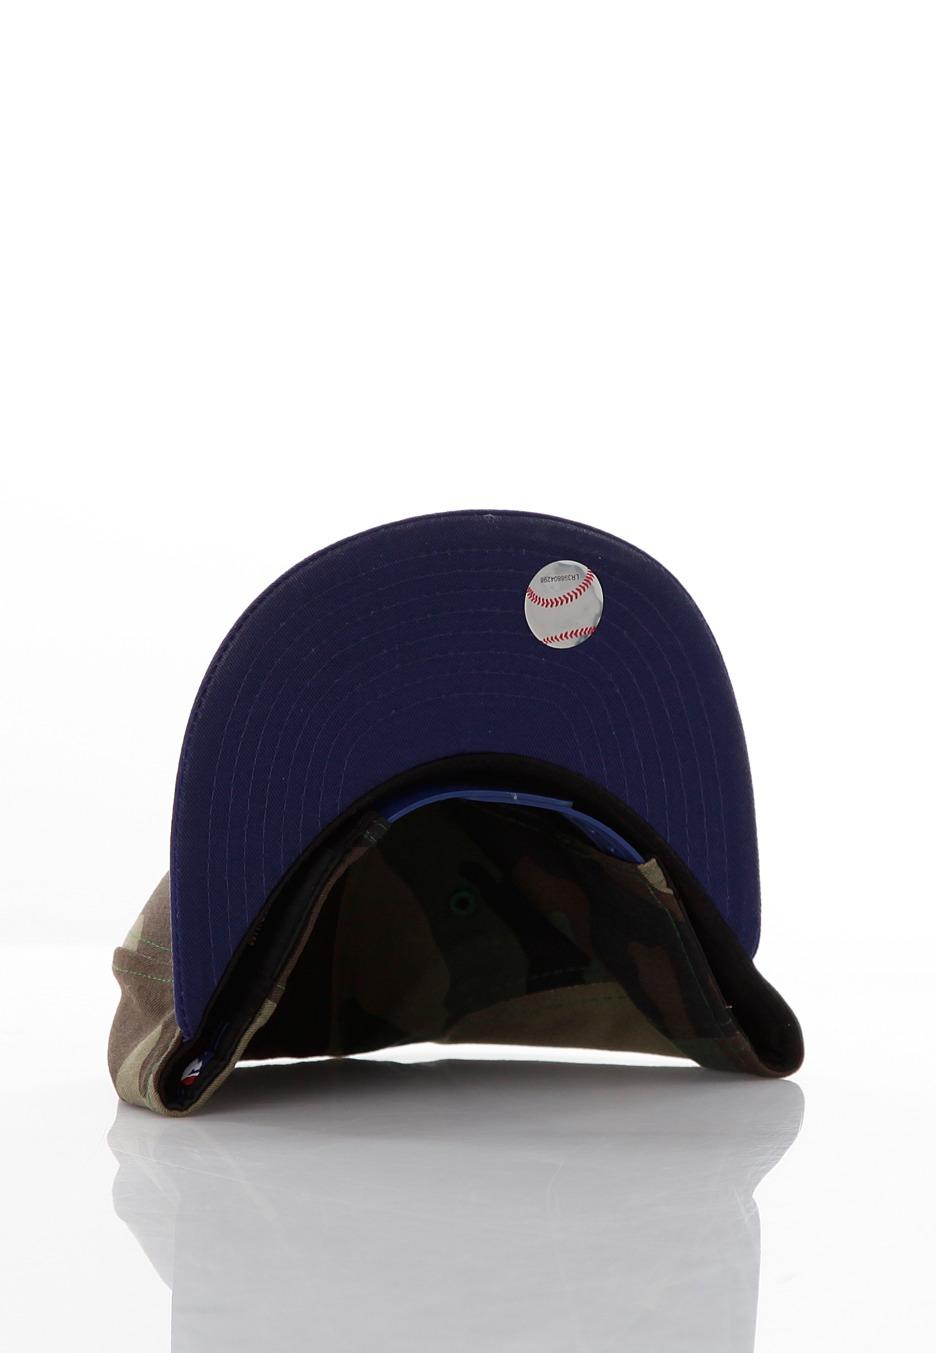 ... New Era - Camo Team Visor 950 New York Yankees Woodland Snapback - Cap  ... 5f46c509ca51